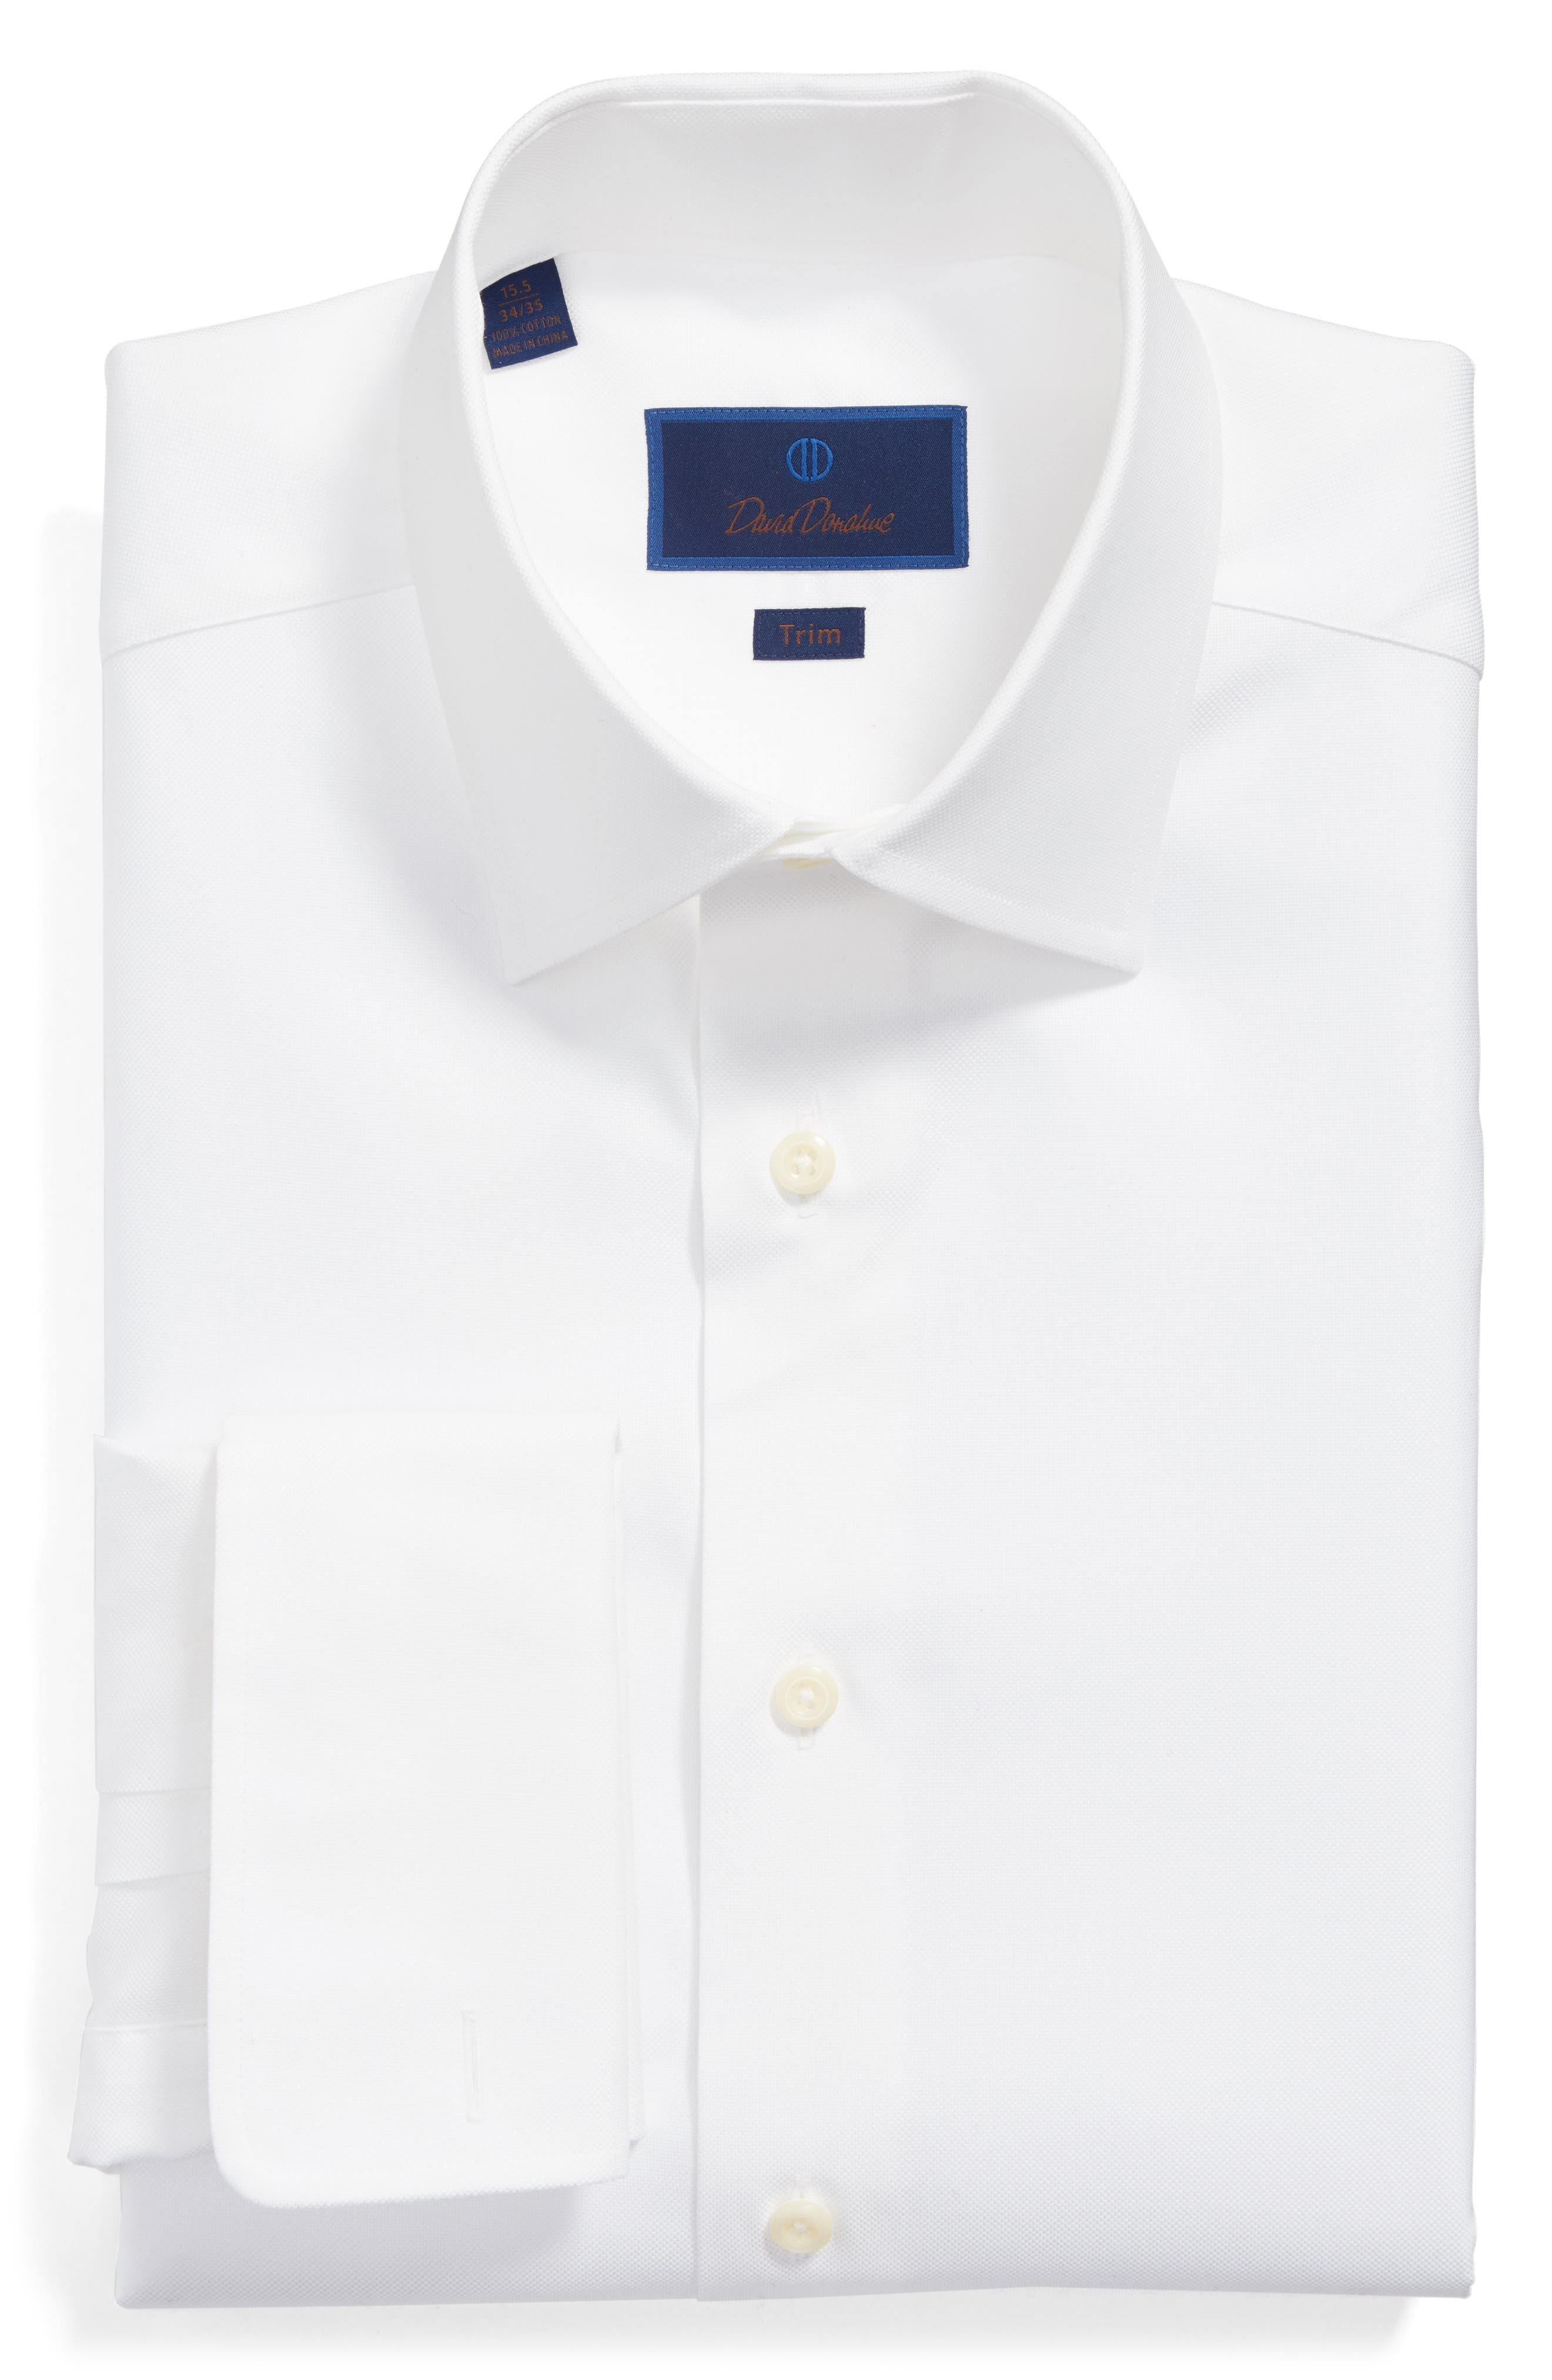 1960s – 70s Mens Shirts- Disco Shirts, Hippie Shirts Mens Big  Tall David Donahue Trim Fit Solid French Cuff Dress Shirt Size 17 - 3637 - White $145.00 AT vintagedancer.com